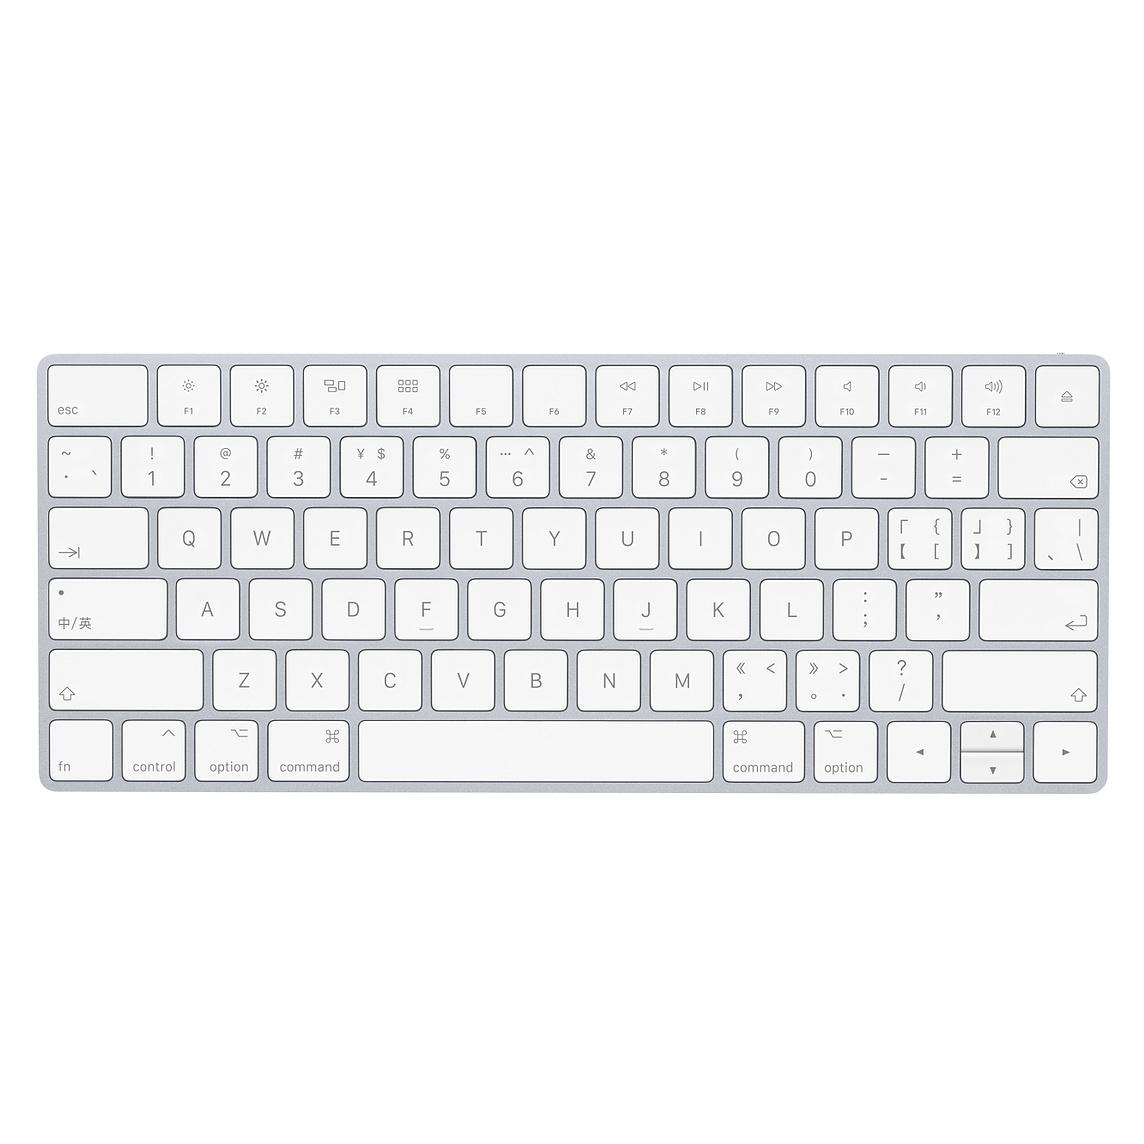 Mac 产品的新中文键盘布局(来源:Apple)